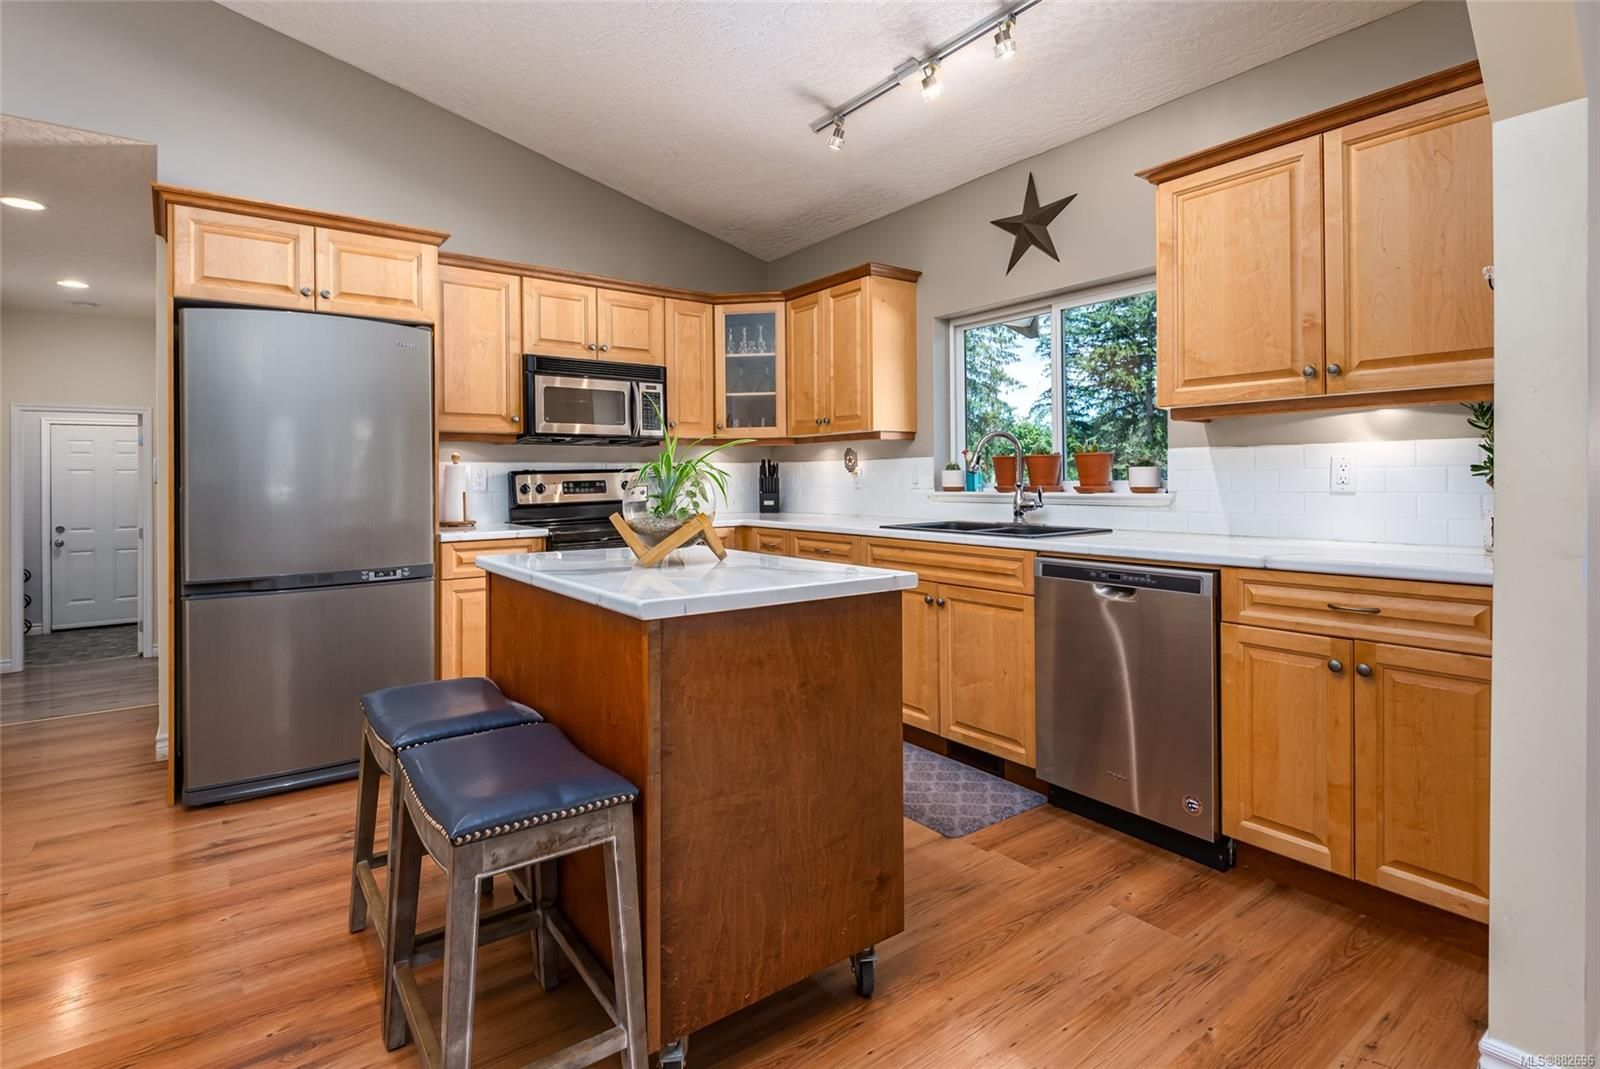 Photo 12: Photos: 3554 MacAulay Rd in : CV Merville Black Creek House for sale (Comox Valley)  : MLS®# 882696